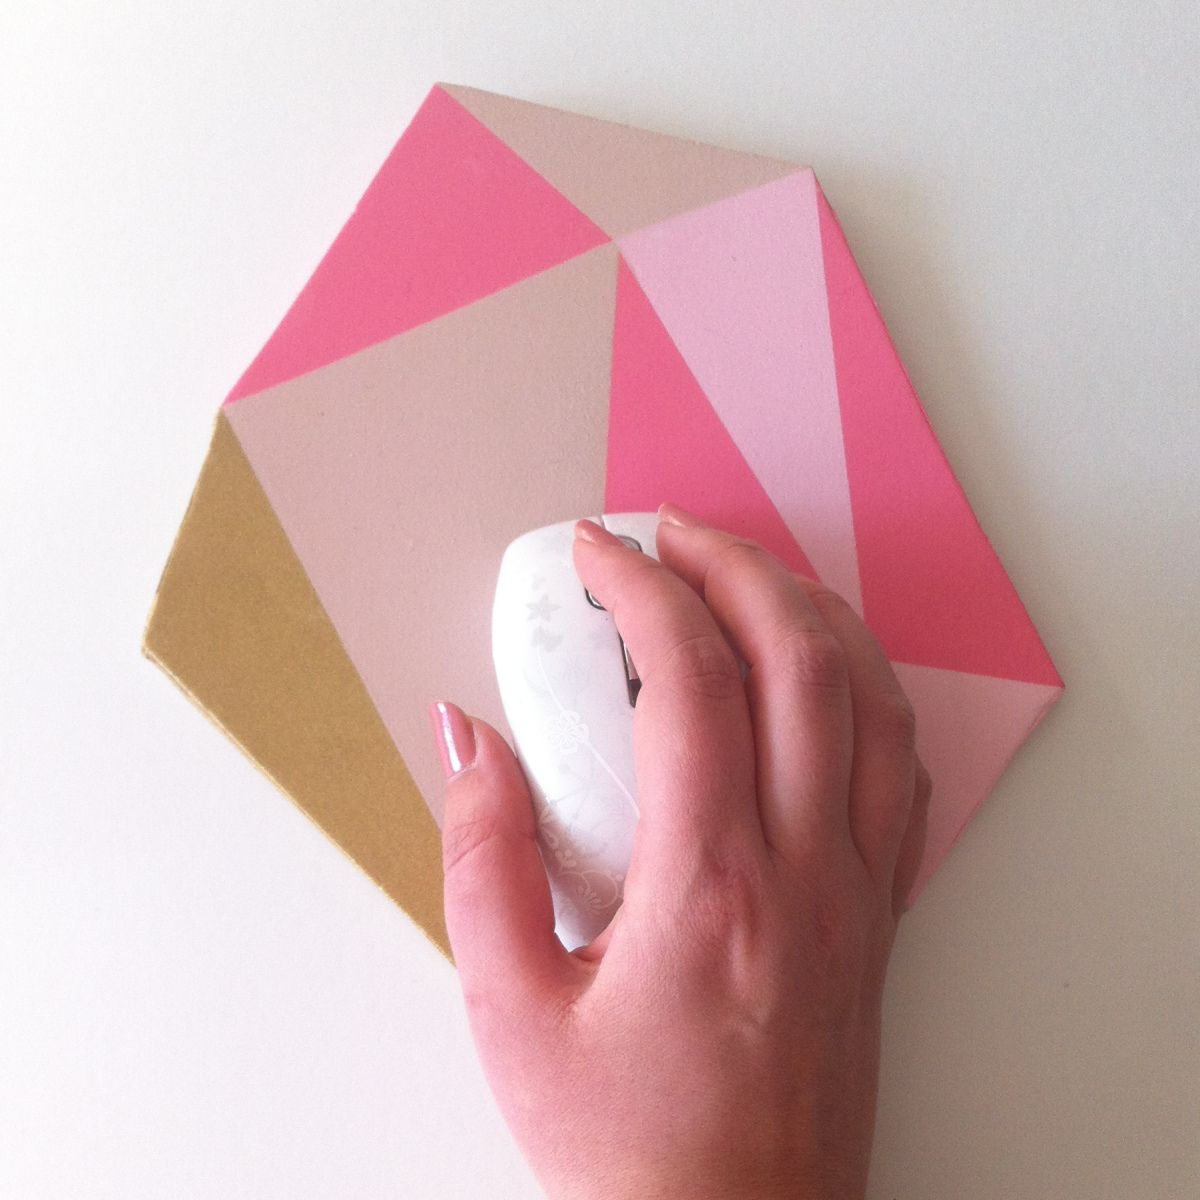 Painting a mouse pad, geometric gem shape